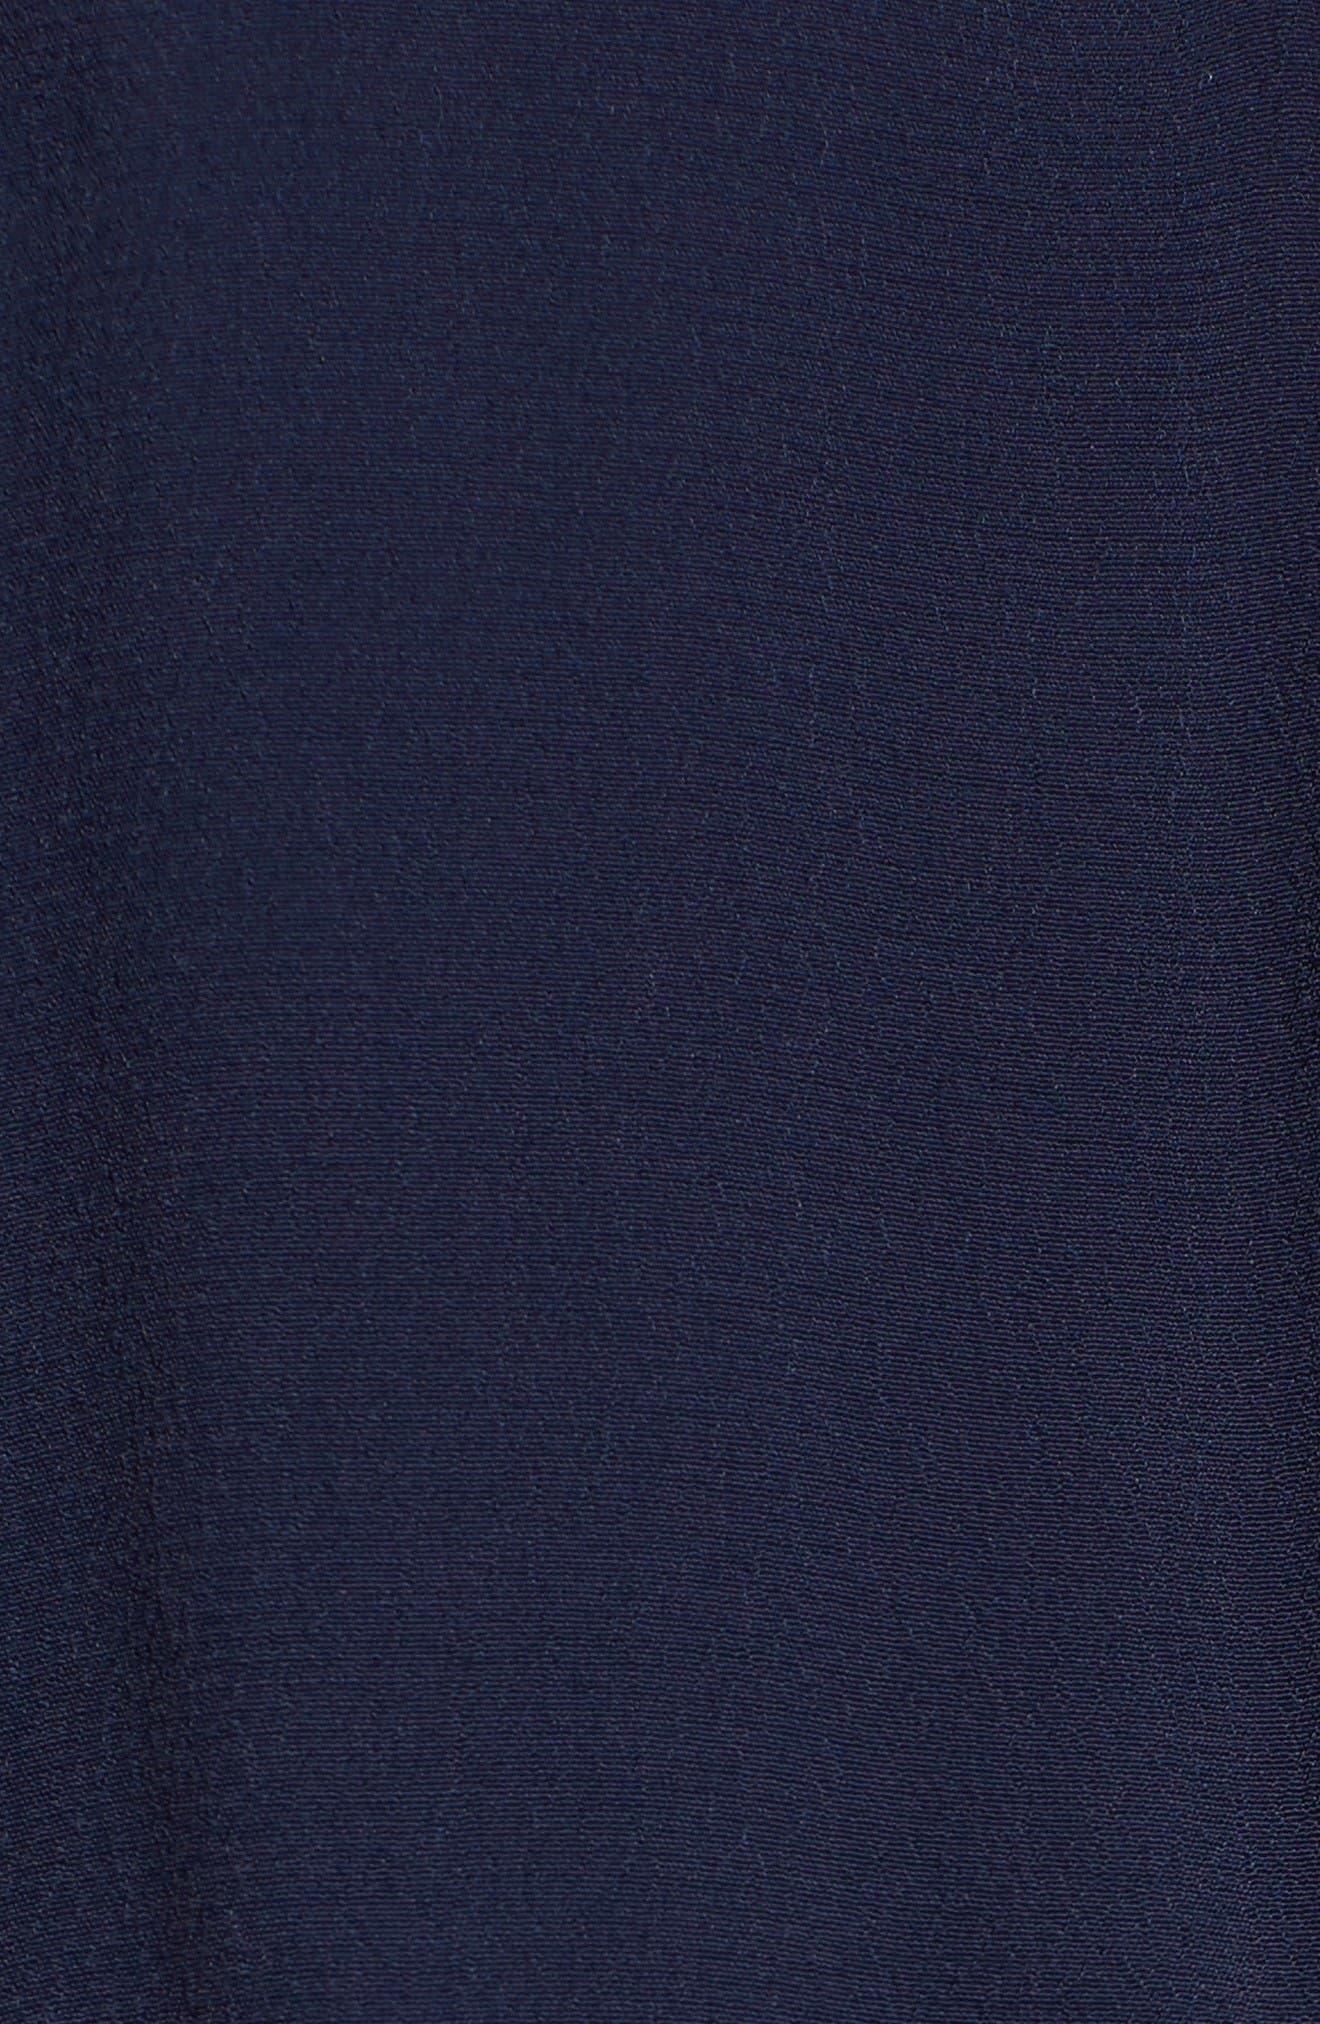 Cold Shoulder Crepe Jumpsuit,                             Alternate thumbnail 5, color,                             Navy